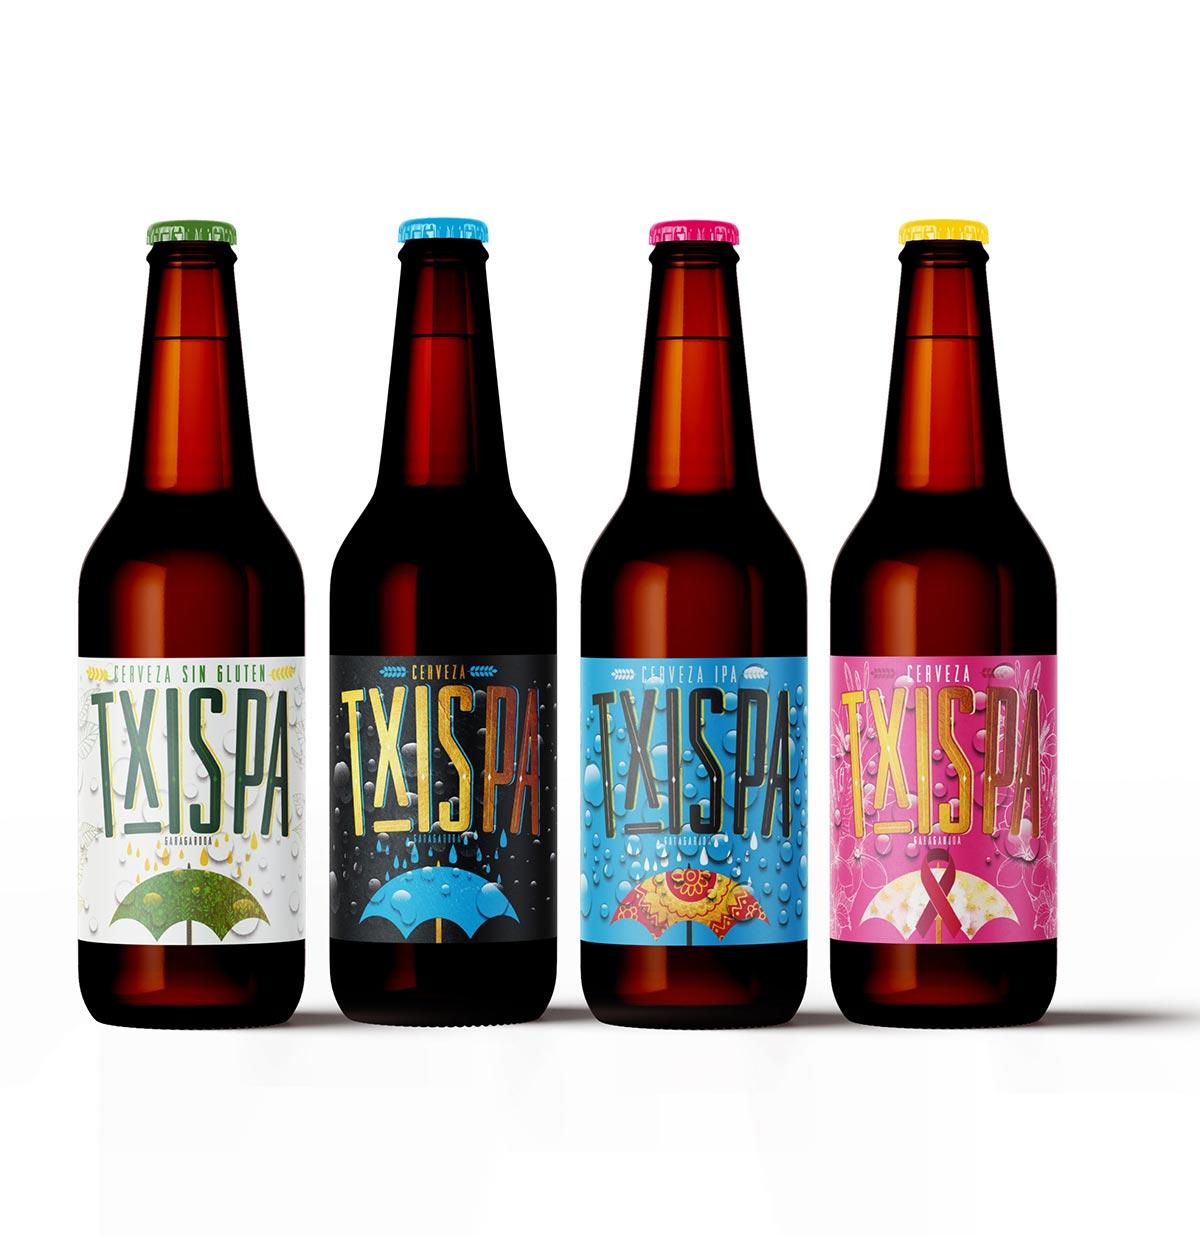 Cervezas Txispa